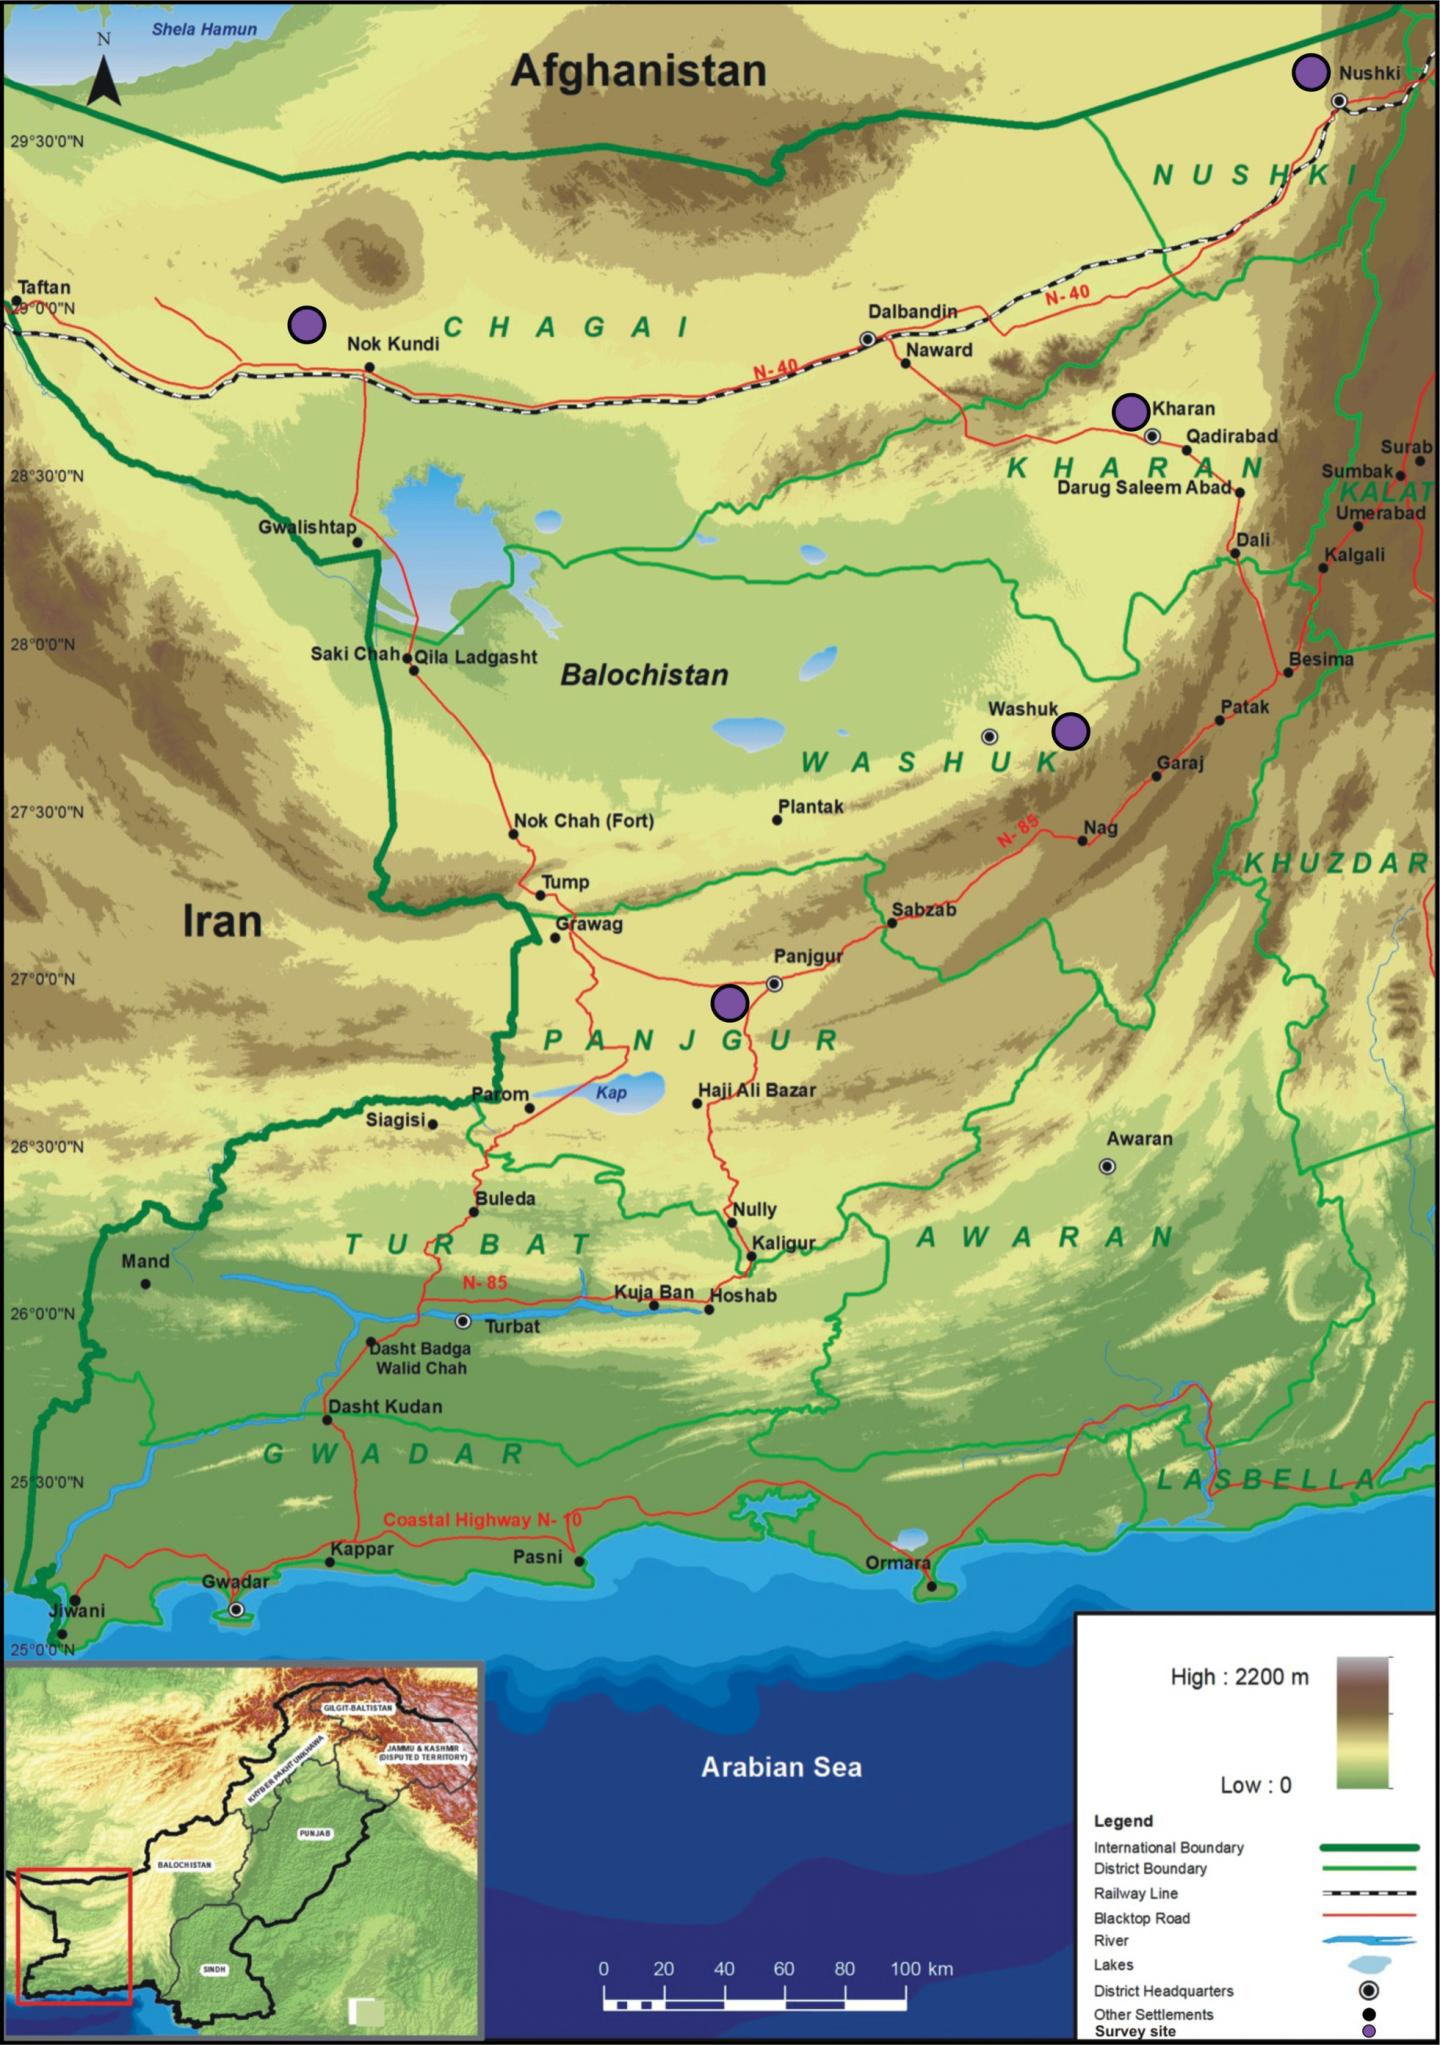 A Topographic Map of Southwestern Balochistan Showing Visit Sites in Chagai, Nushki, Panjgur, Kharan